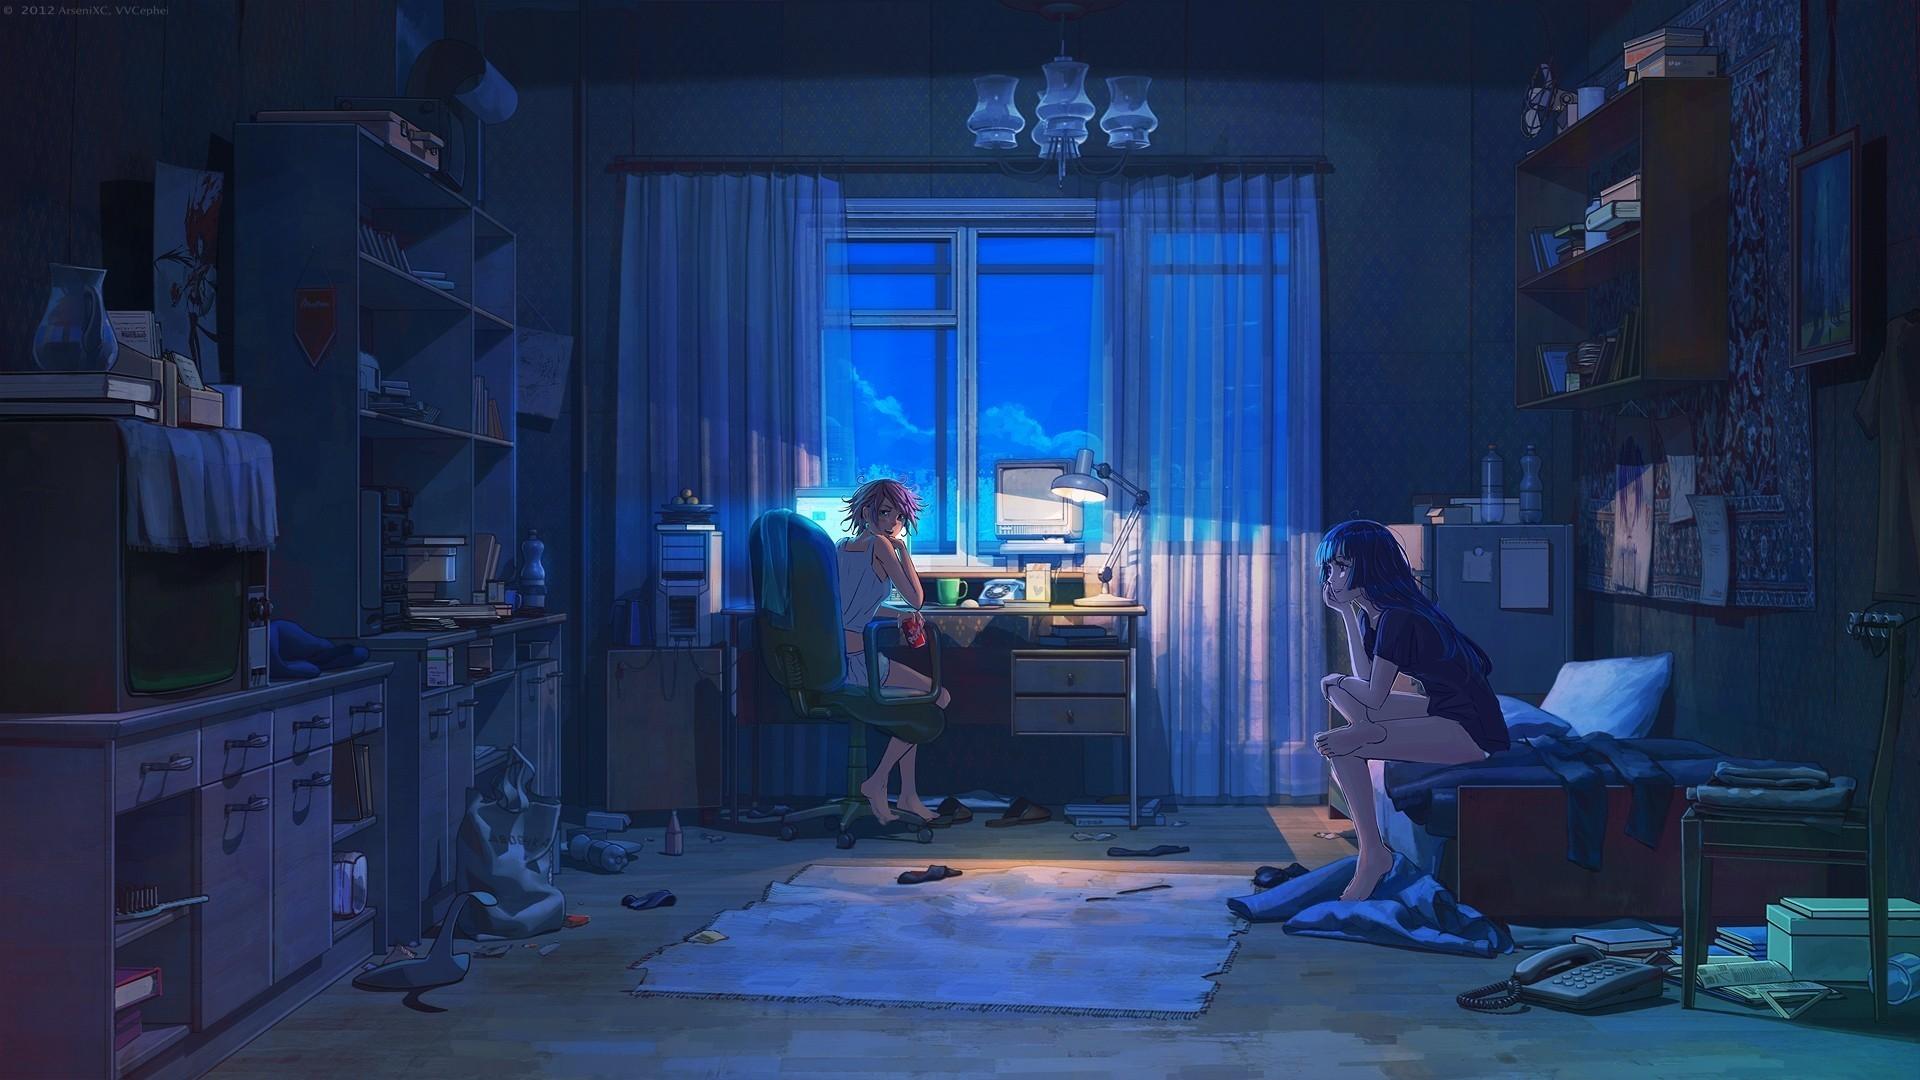 Anime Background 83 Images